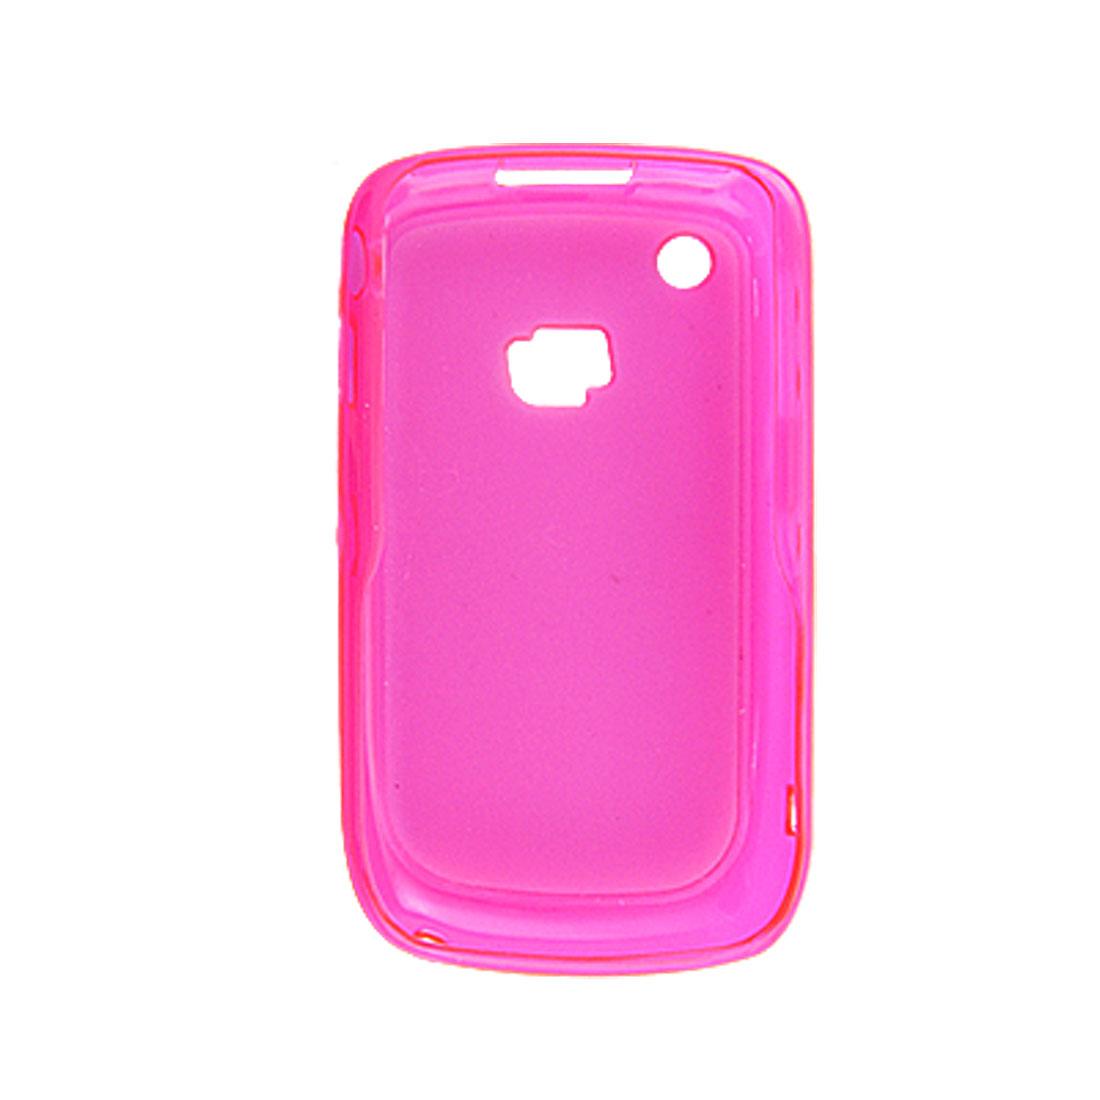 Hot Pink Plastic Back Protector Case for Blackberry 8520 9300